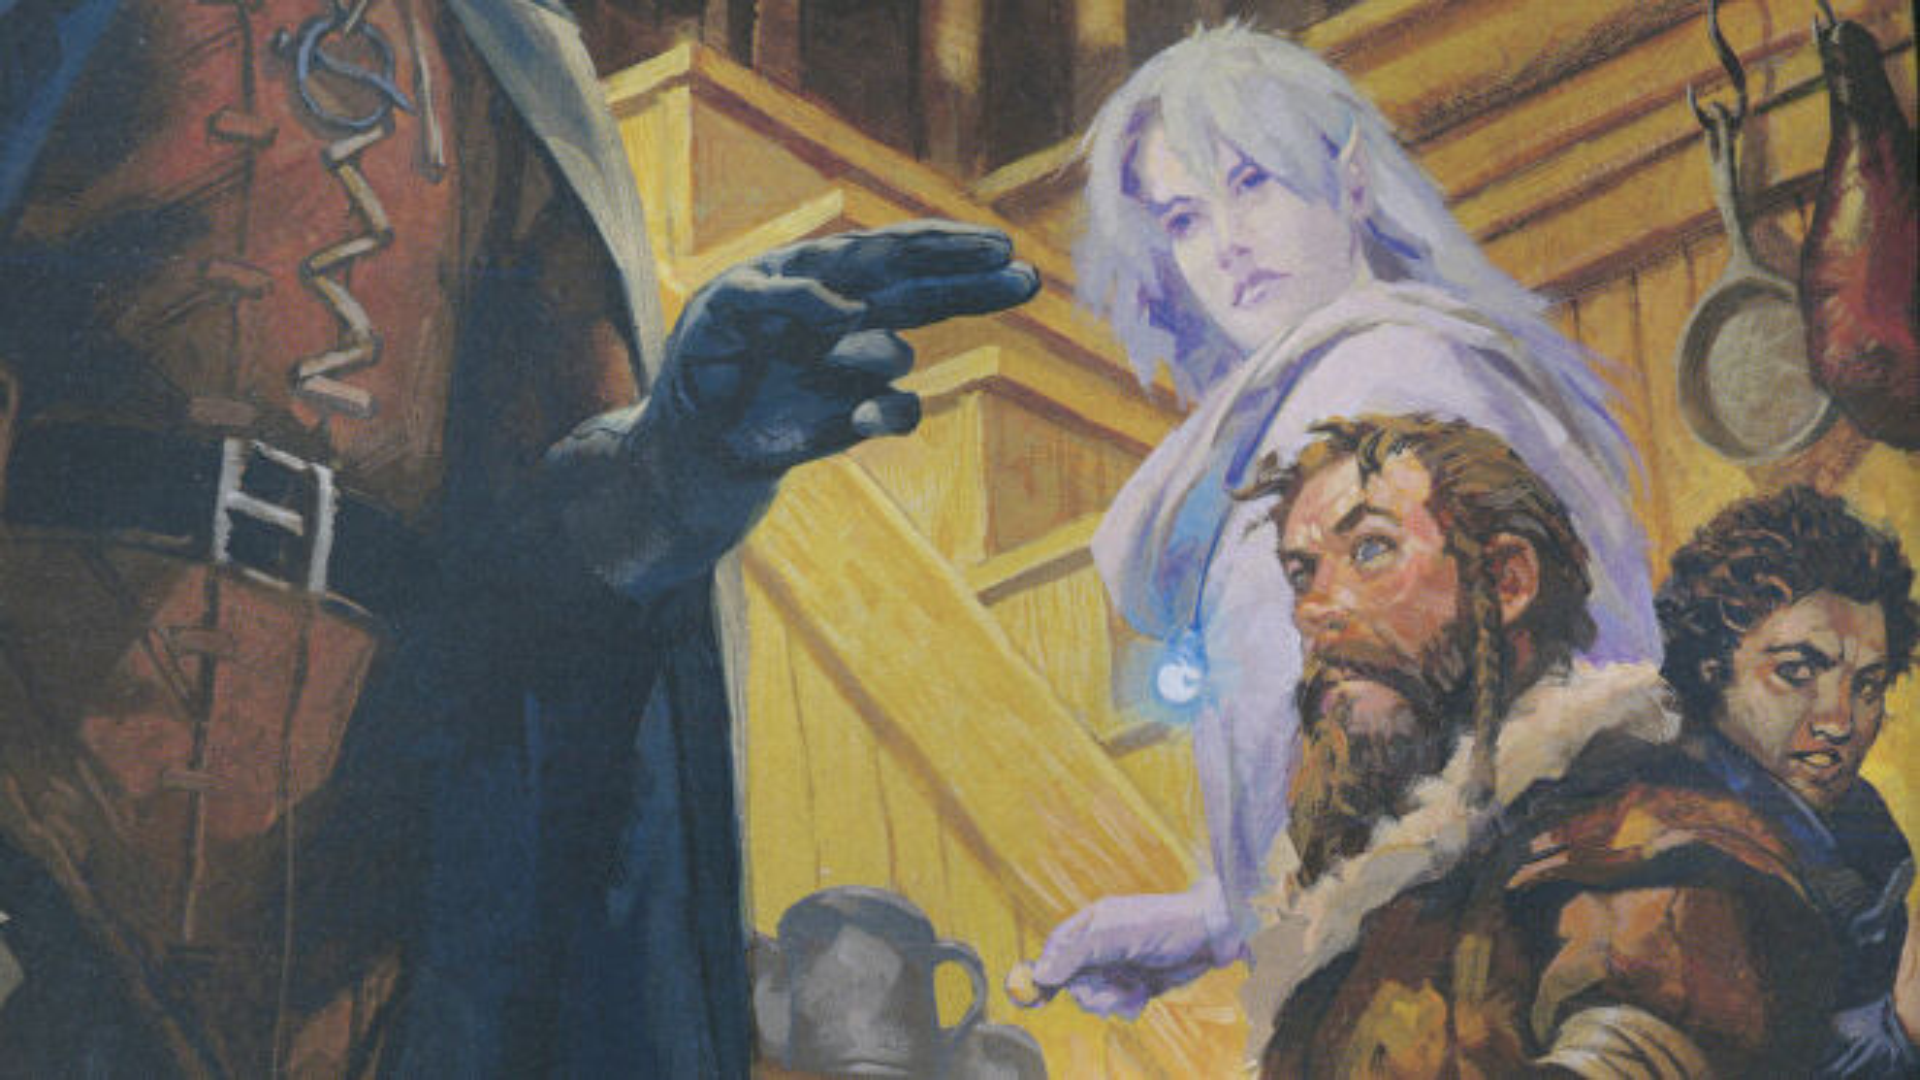 Dungeons & Dragons 5e Players Handbook artwork 2